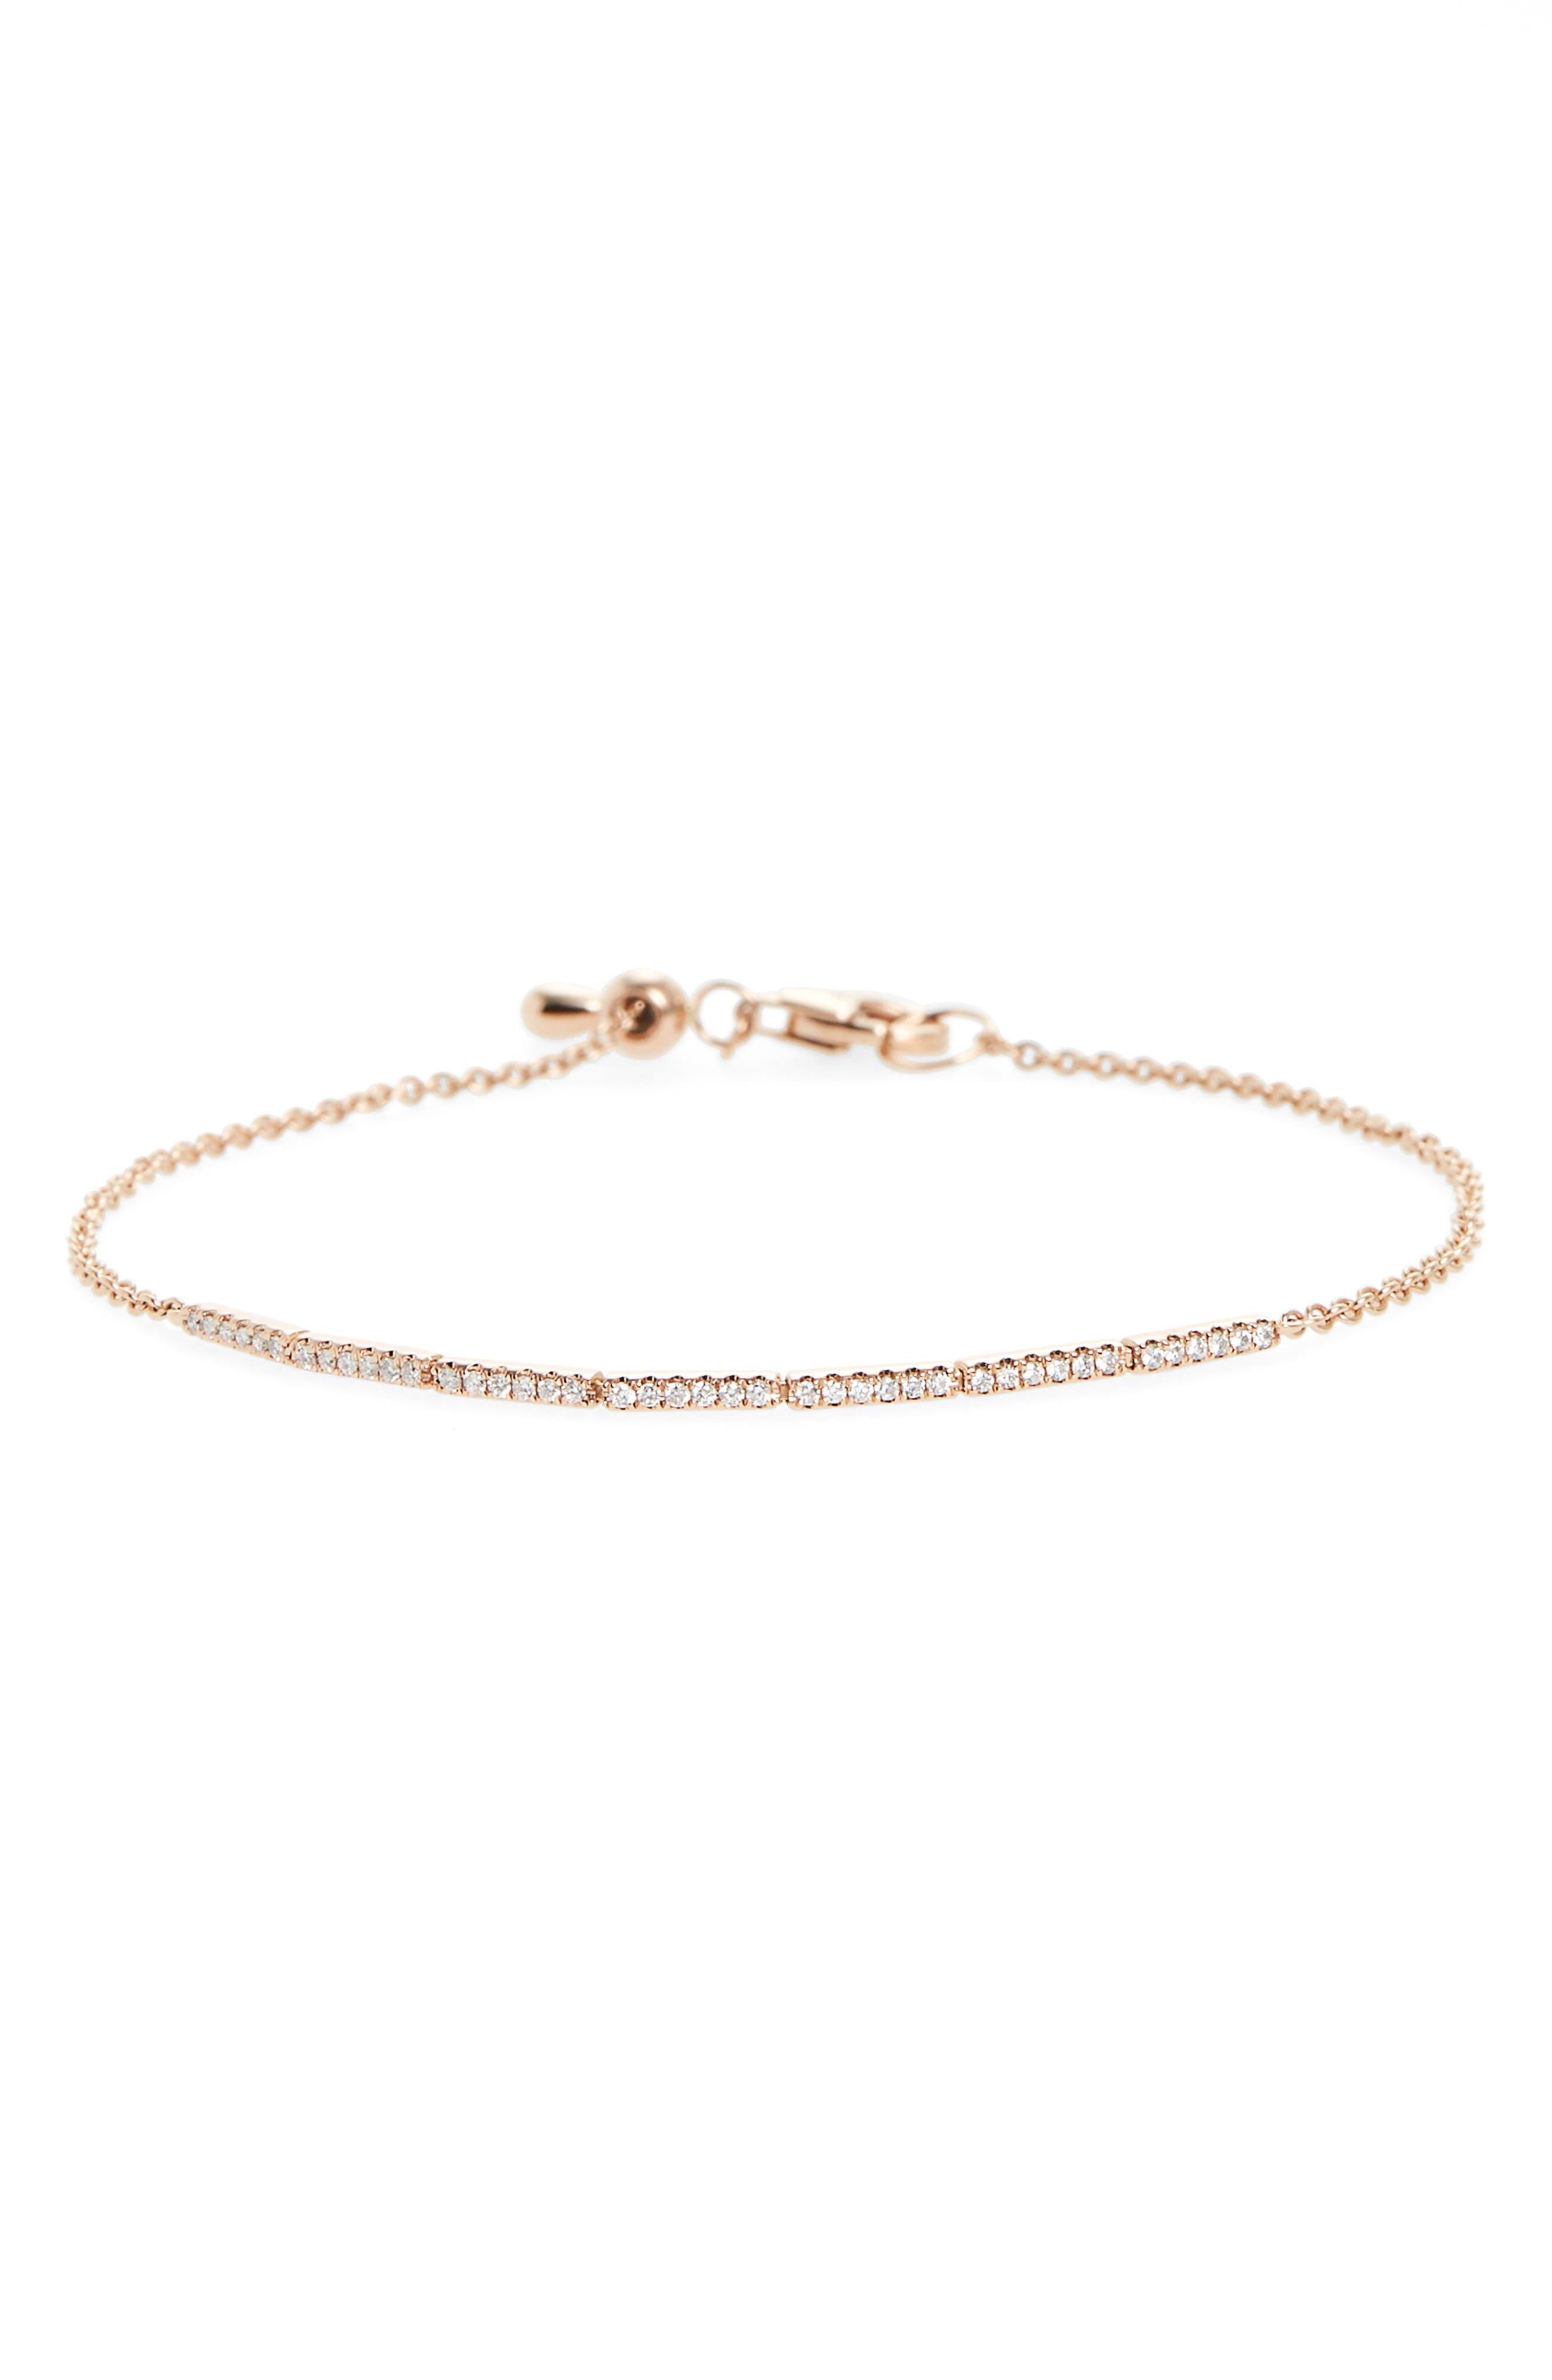 Aviva Adjustable Diamond Bar Bracelet,                             Main thumbnail 1, color,                             YELLOW GOLD